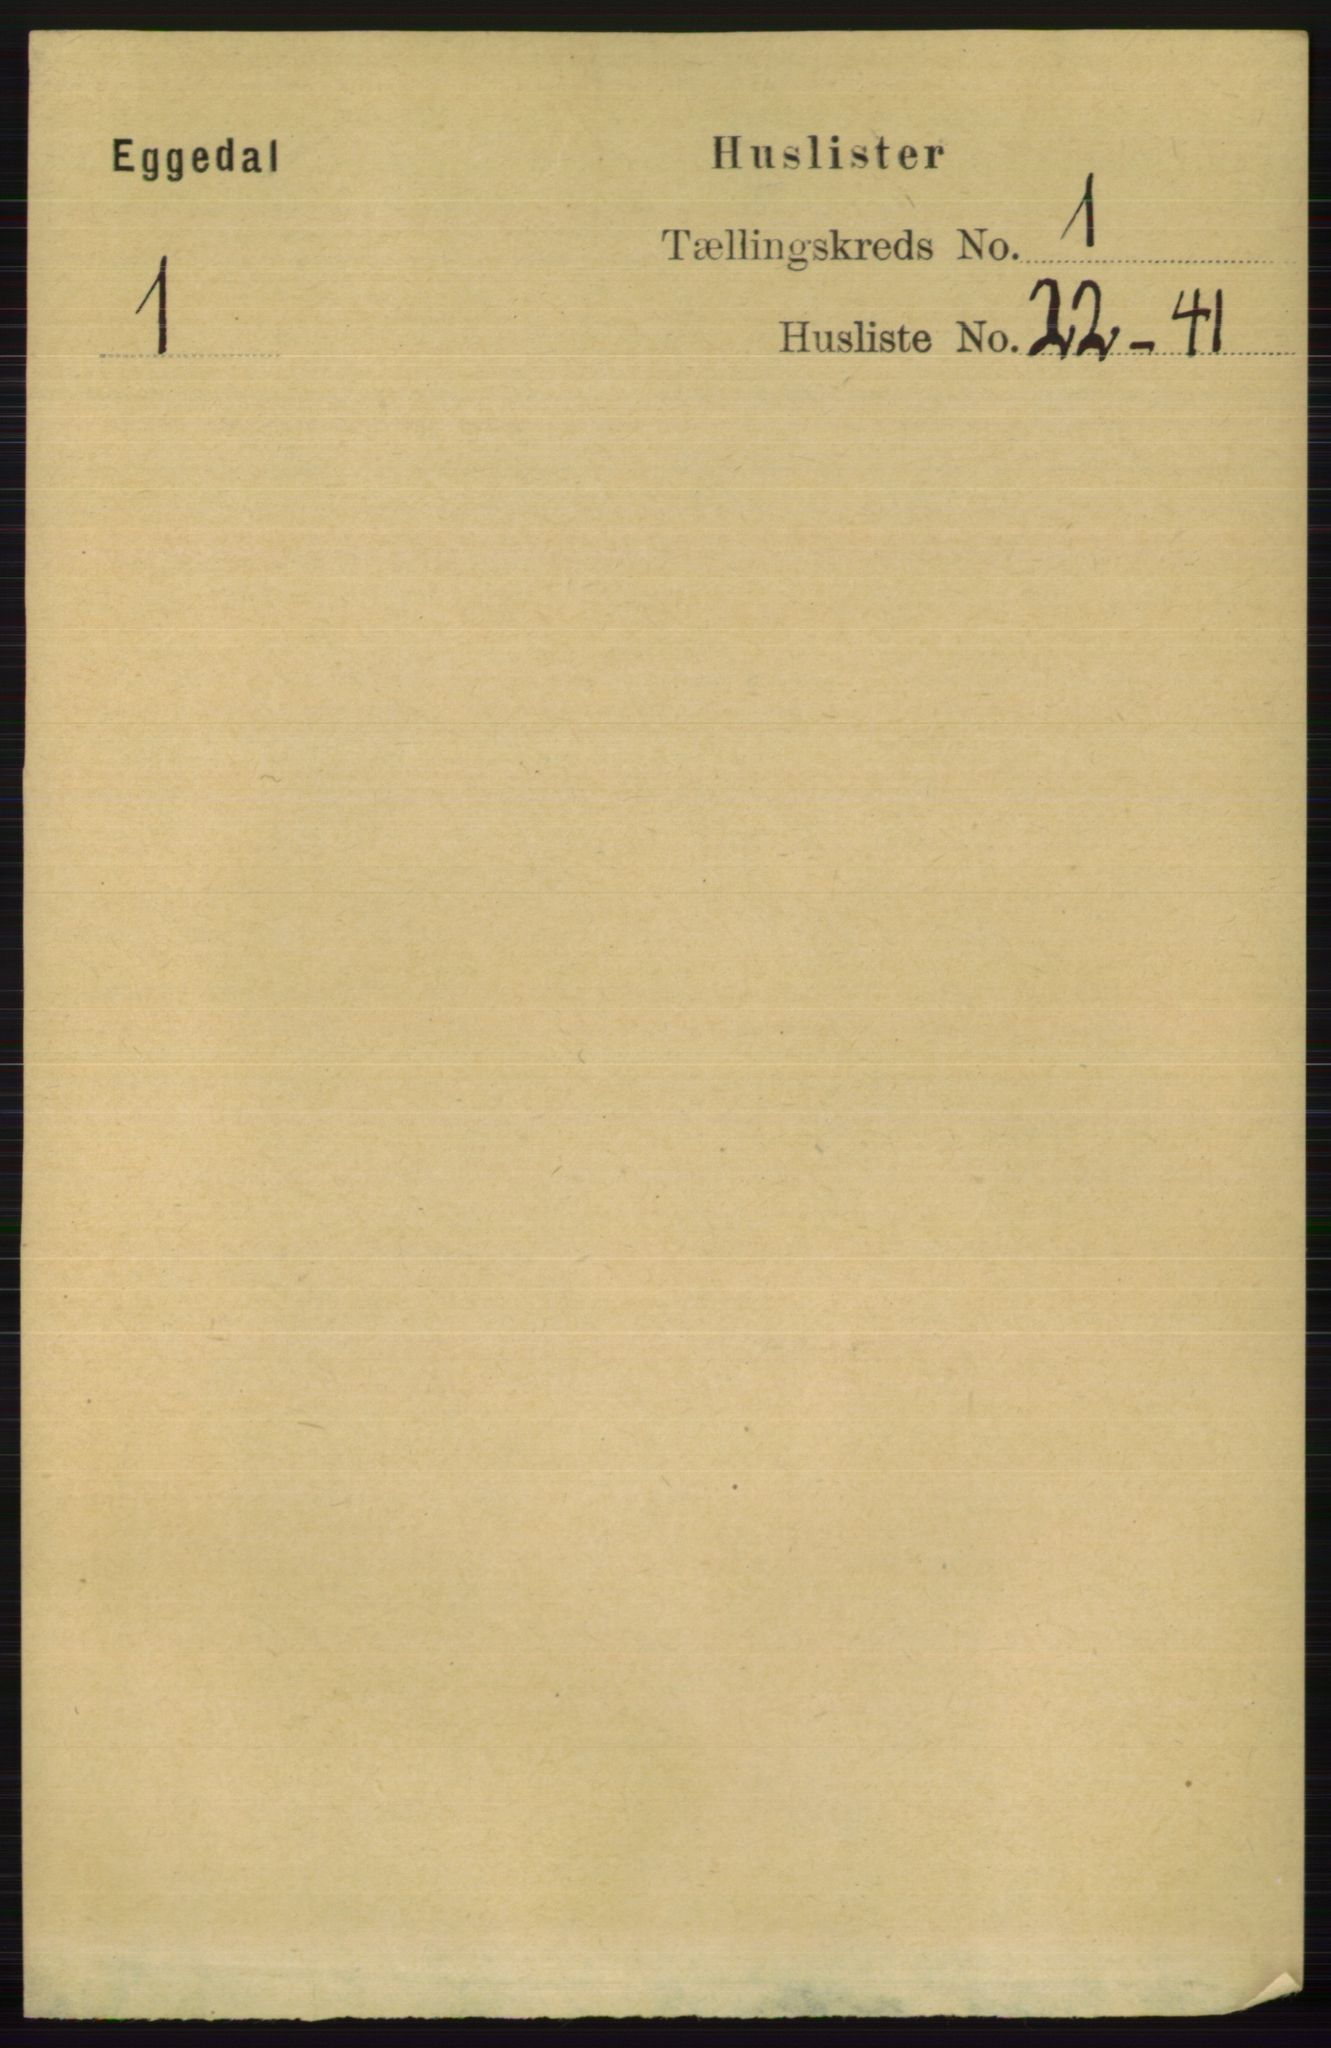 RA, Folketelling 1891 for 0621 Sigdal herred, 1891, s. 3689